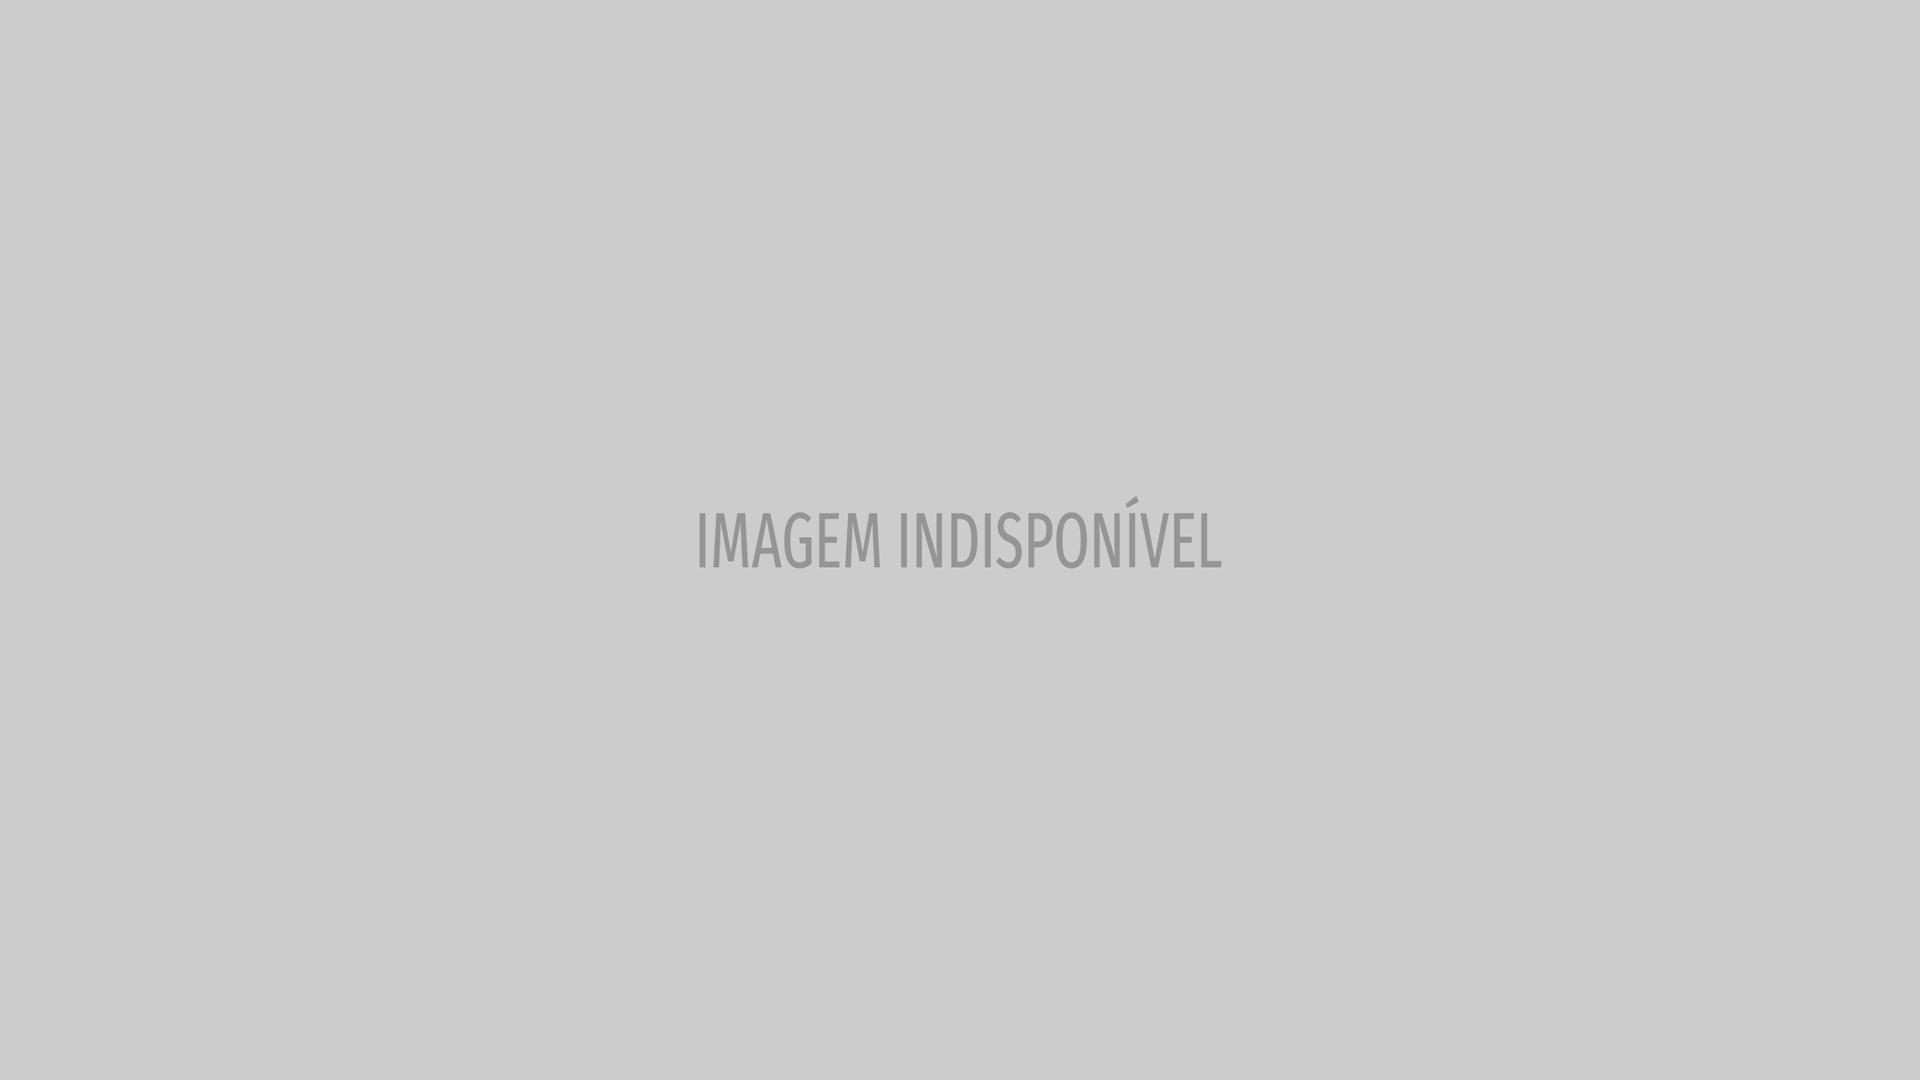 Marina Ruy Barbosa x Bruna Marquezine: veja os looks das famosas